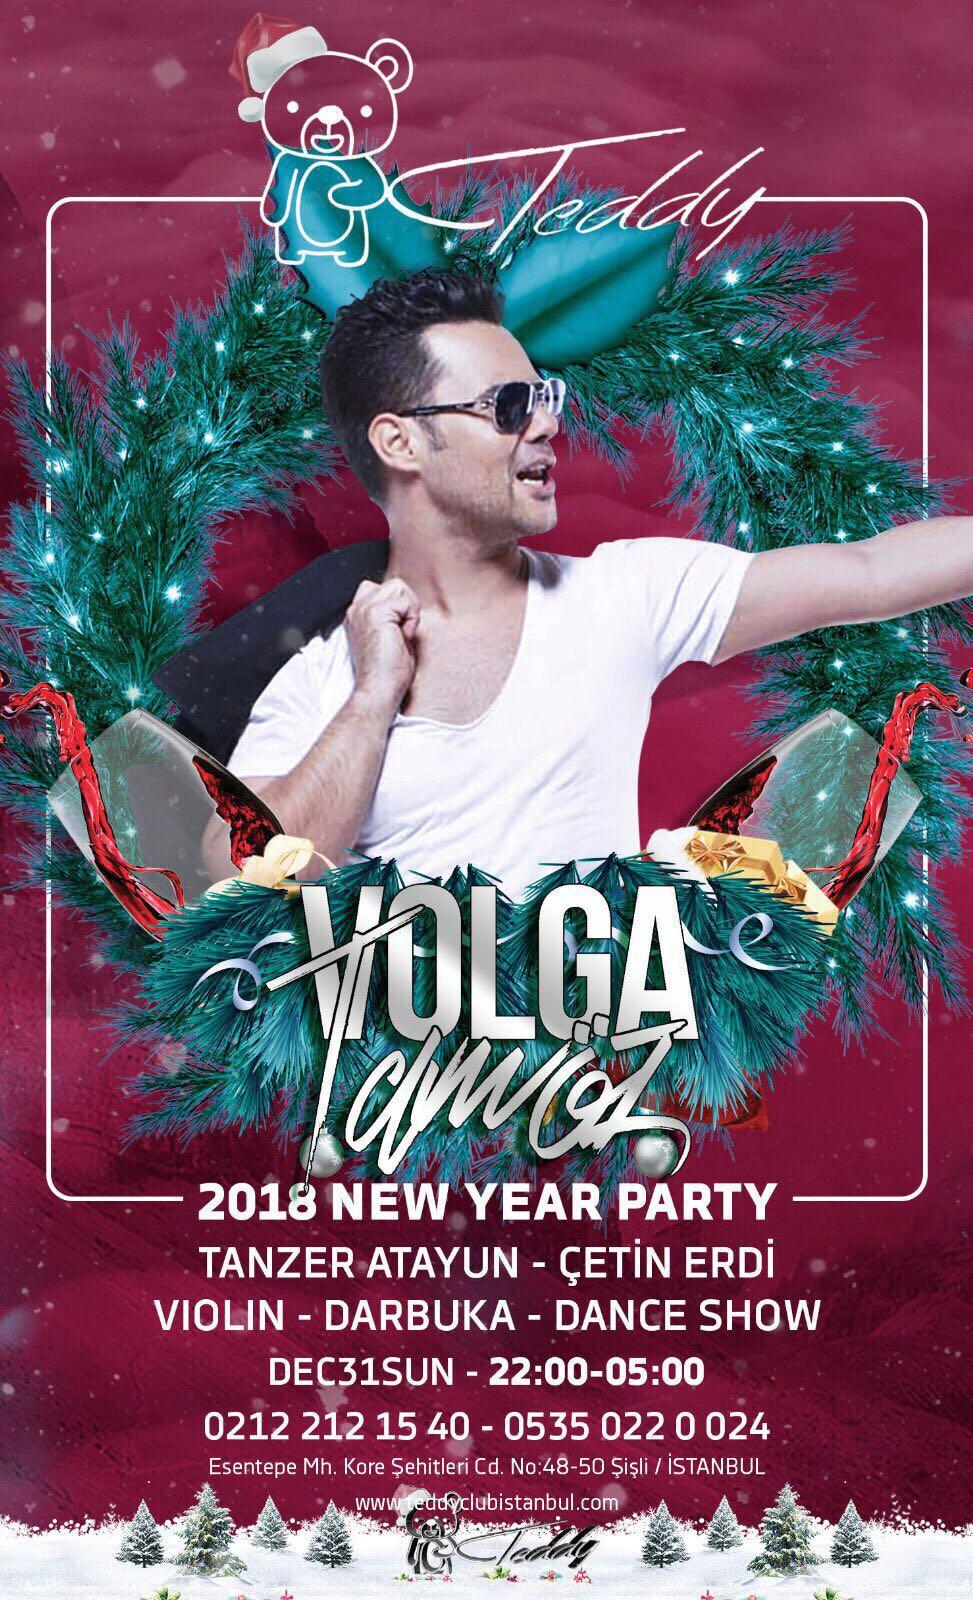 Yılbaşında Volga Tamöz'den Muhteşem DJ Performansı!..